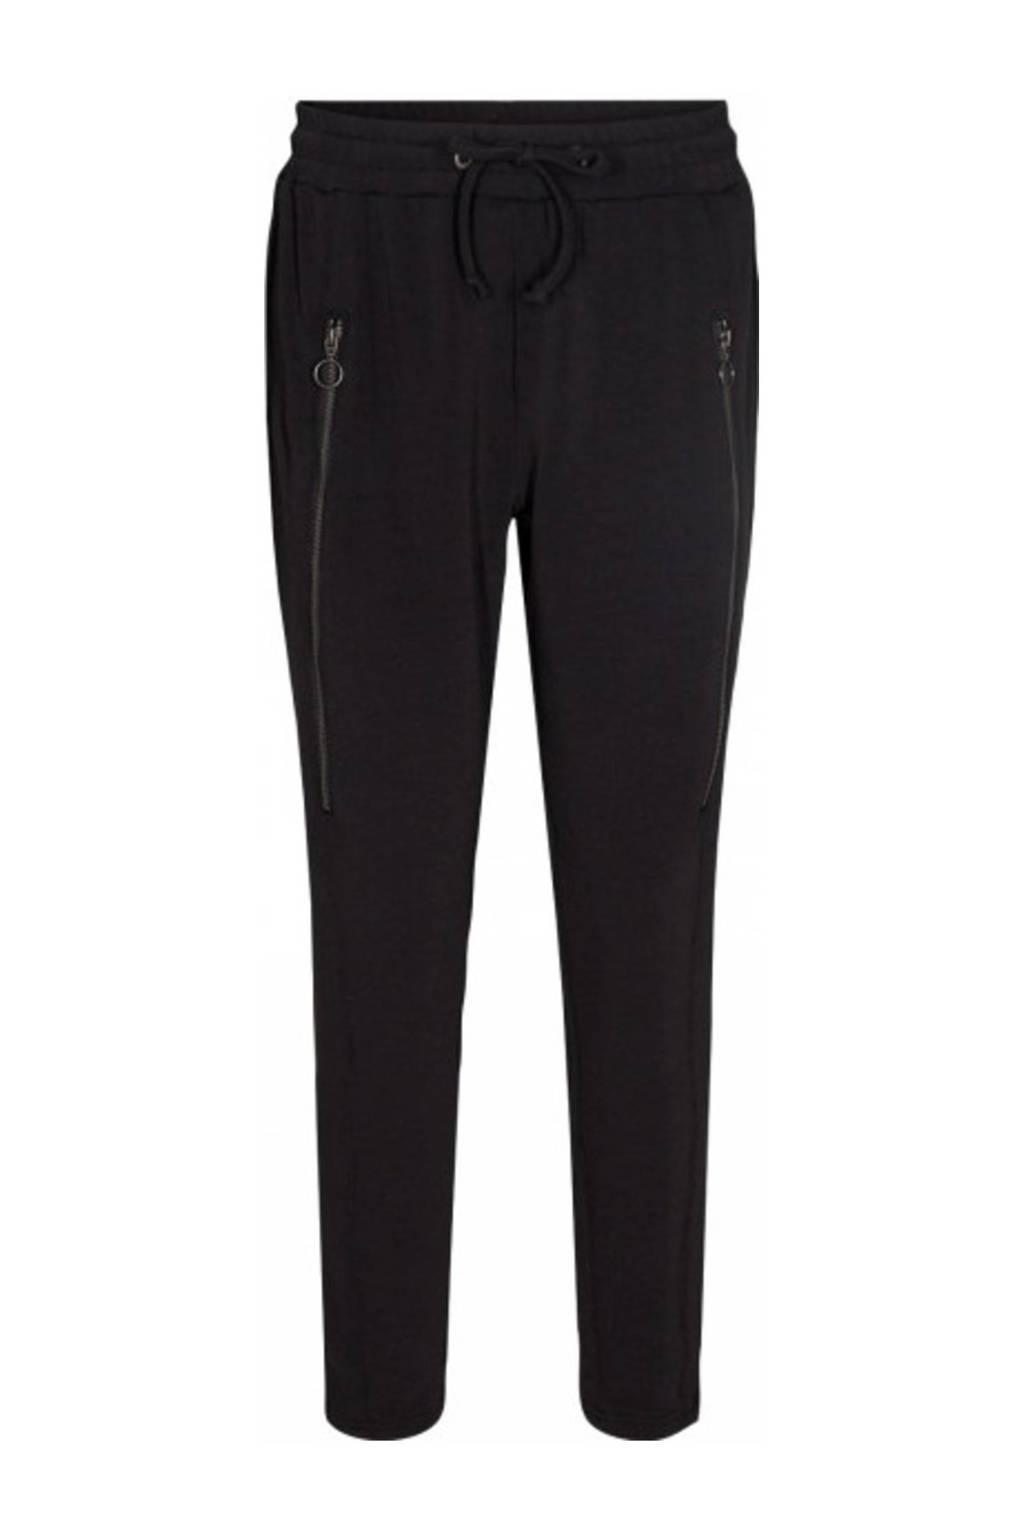 Soyaconcept slim fit broek SC-LEXCIA 1-B zwart, Zwart